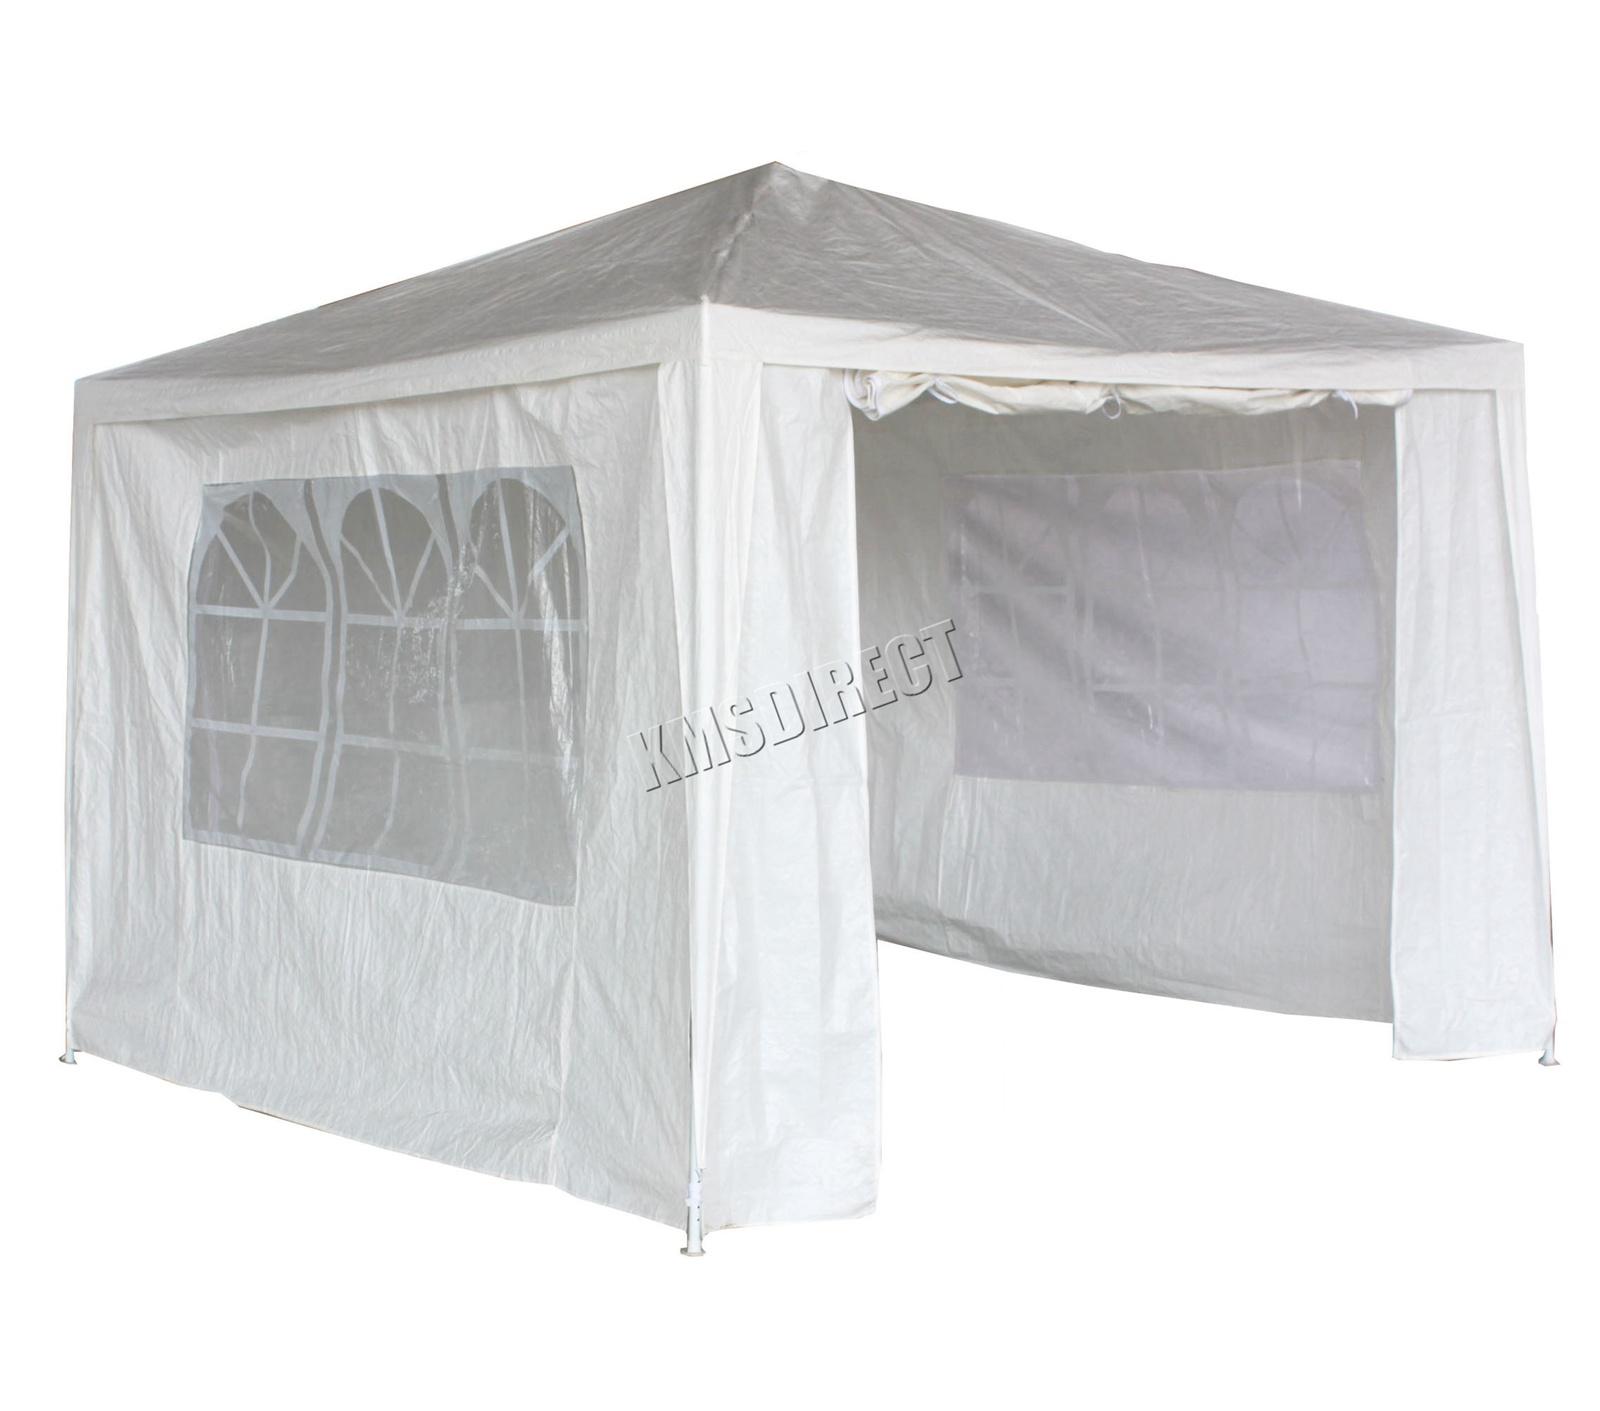 New-3-x-3m-120g-Waterproof-Outdoor-PE-Garden-Gazebo-Marquee-Canopy-Party-Tent Indexbild 28